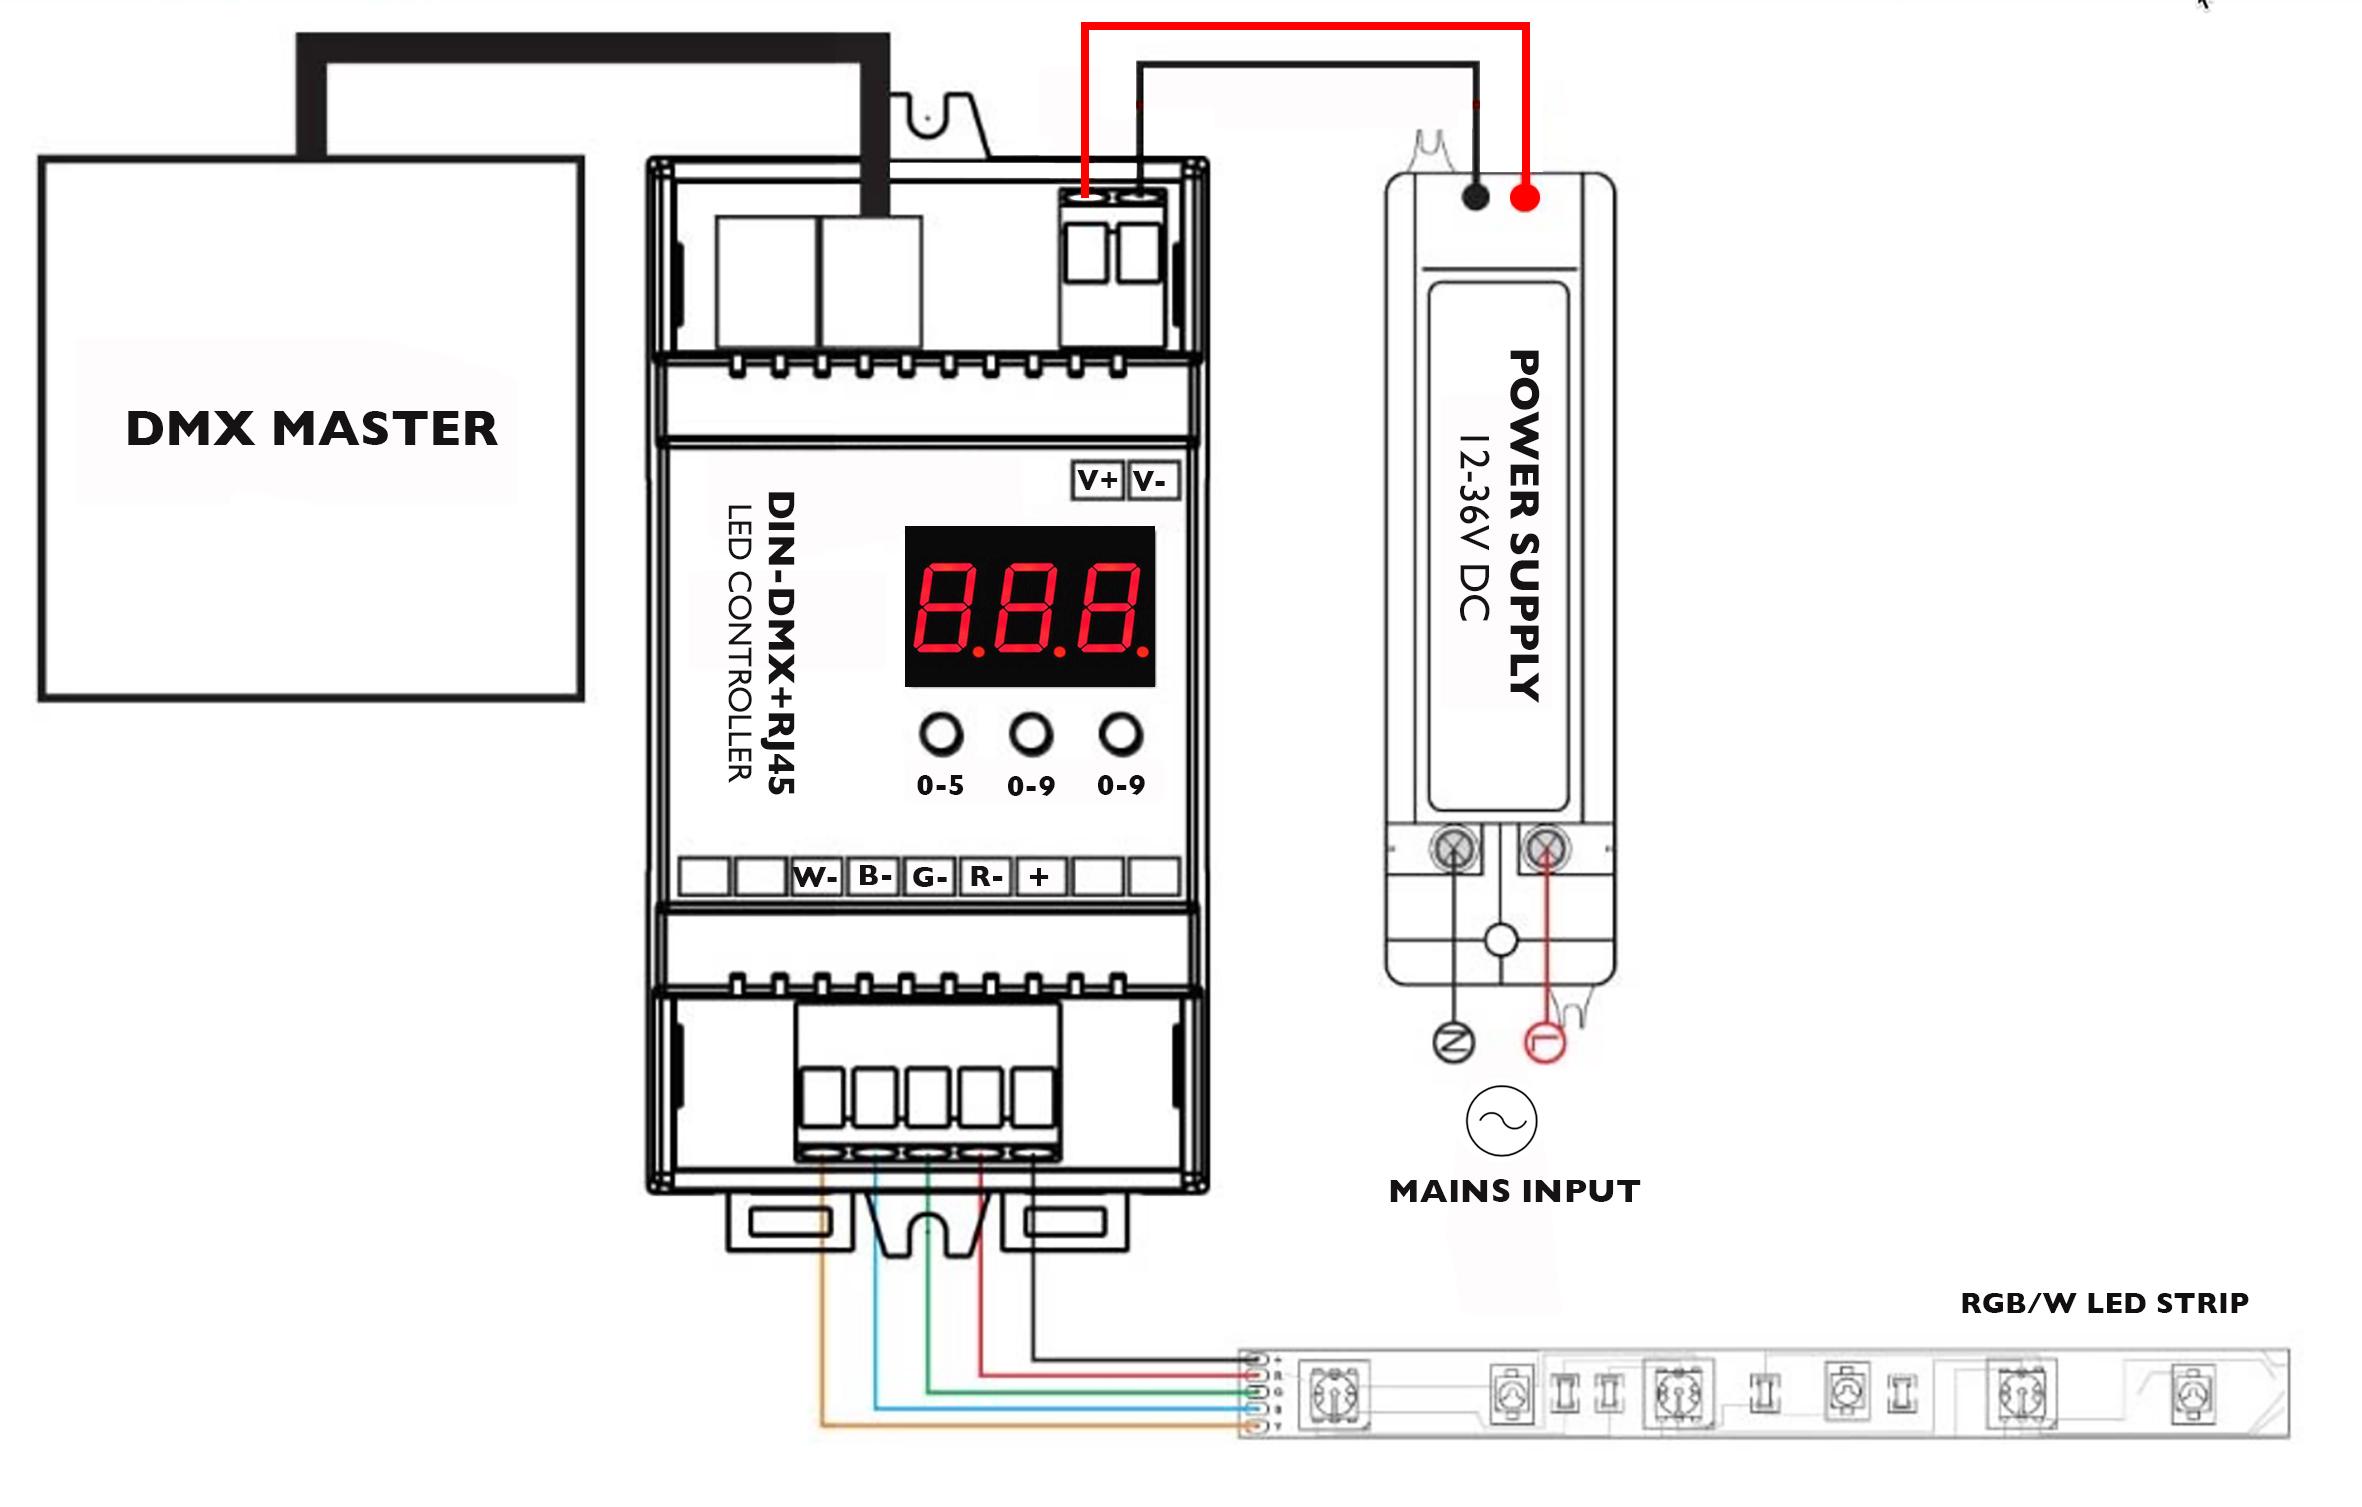 5 pin dmx wiring diagram teeth with wisdom 512 further led controller rgb